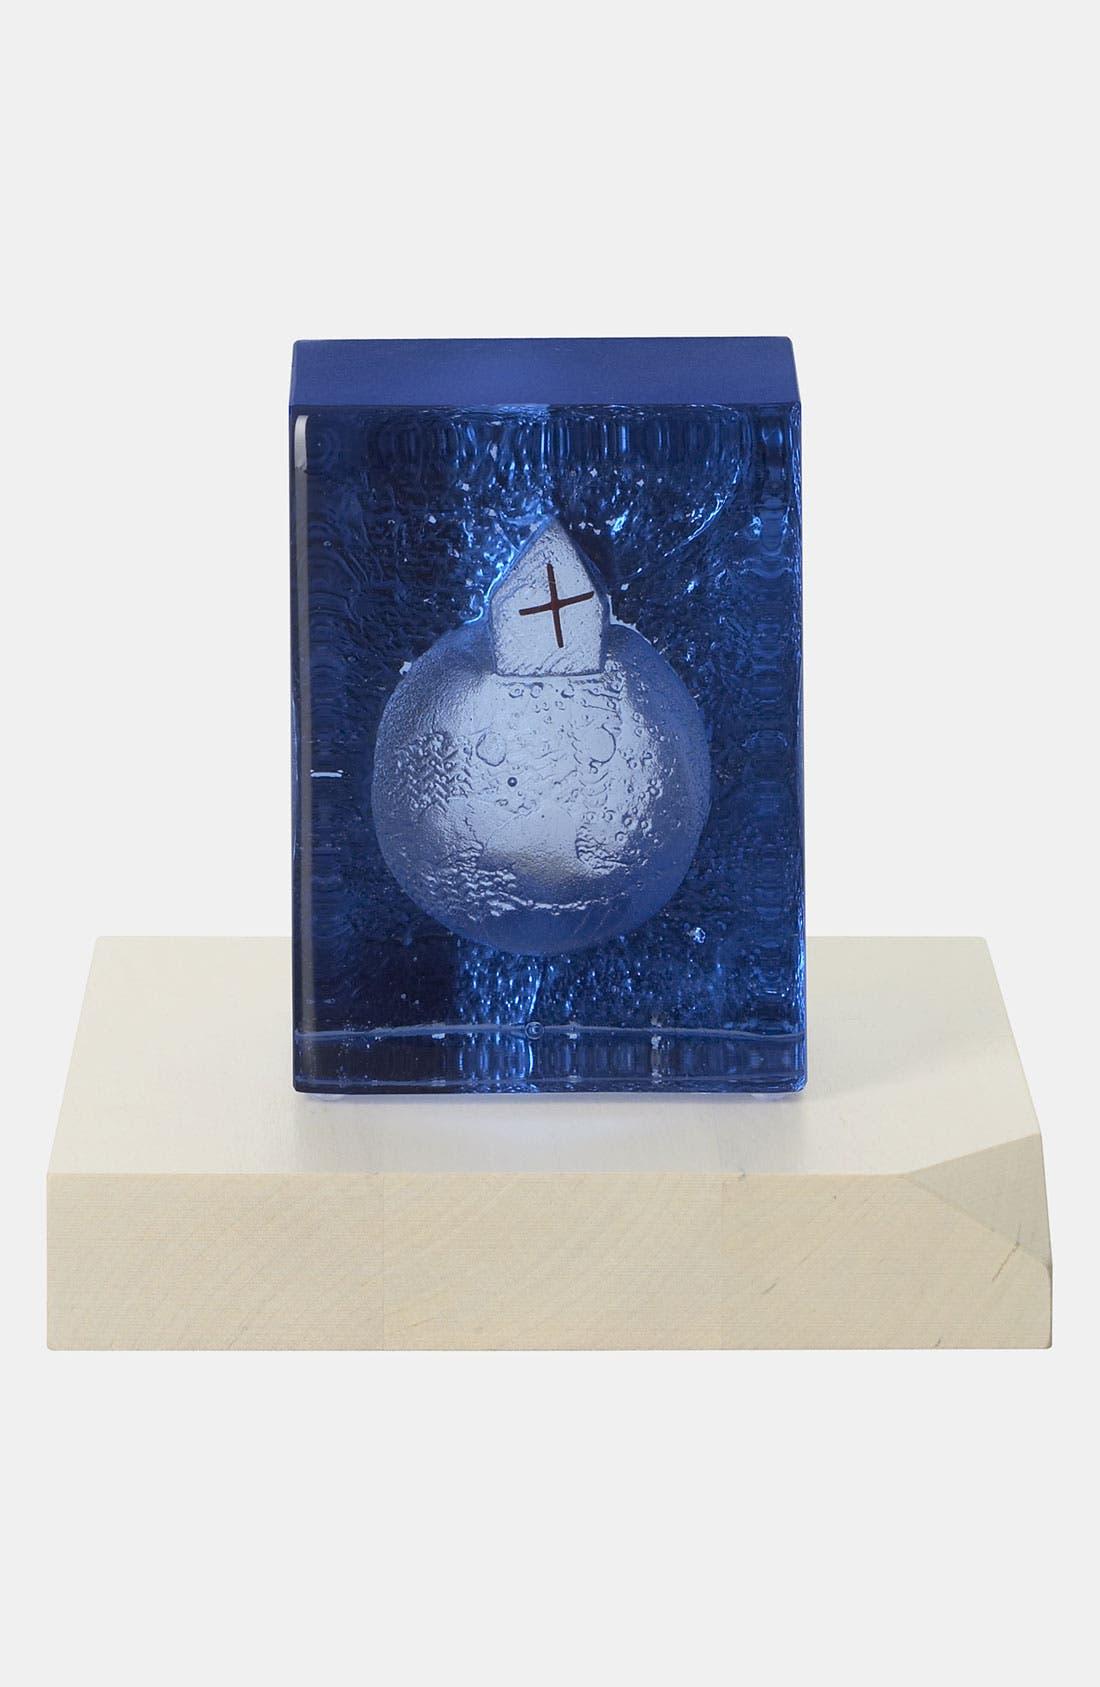 Alternate Image 1 Selected - Kosta Boda 'Dreams in Space' Sculpture